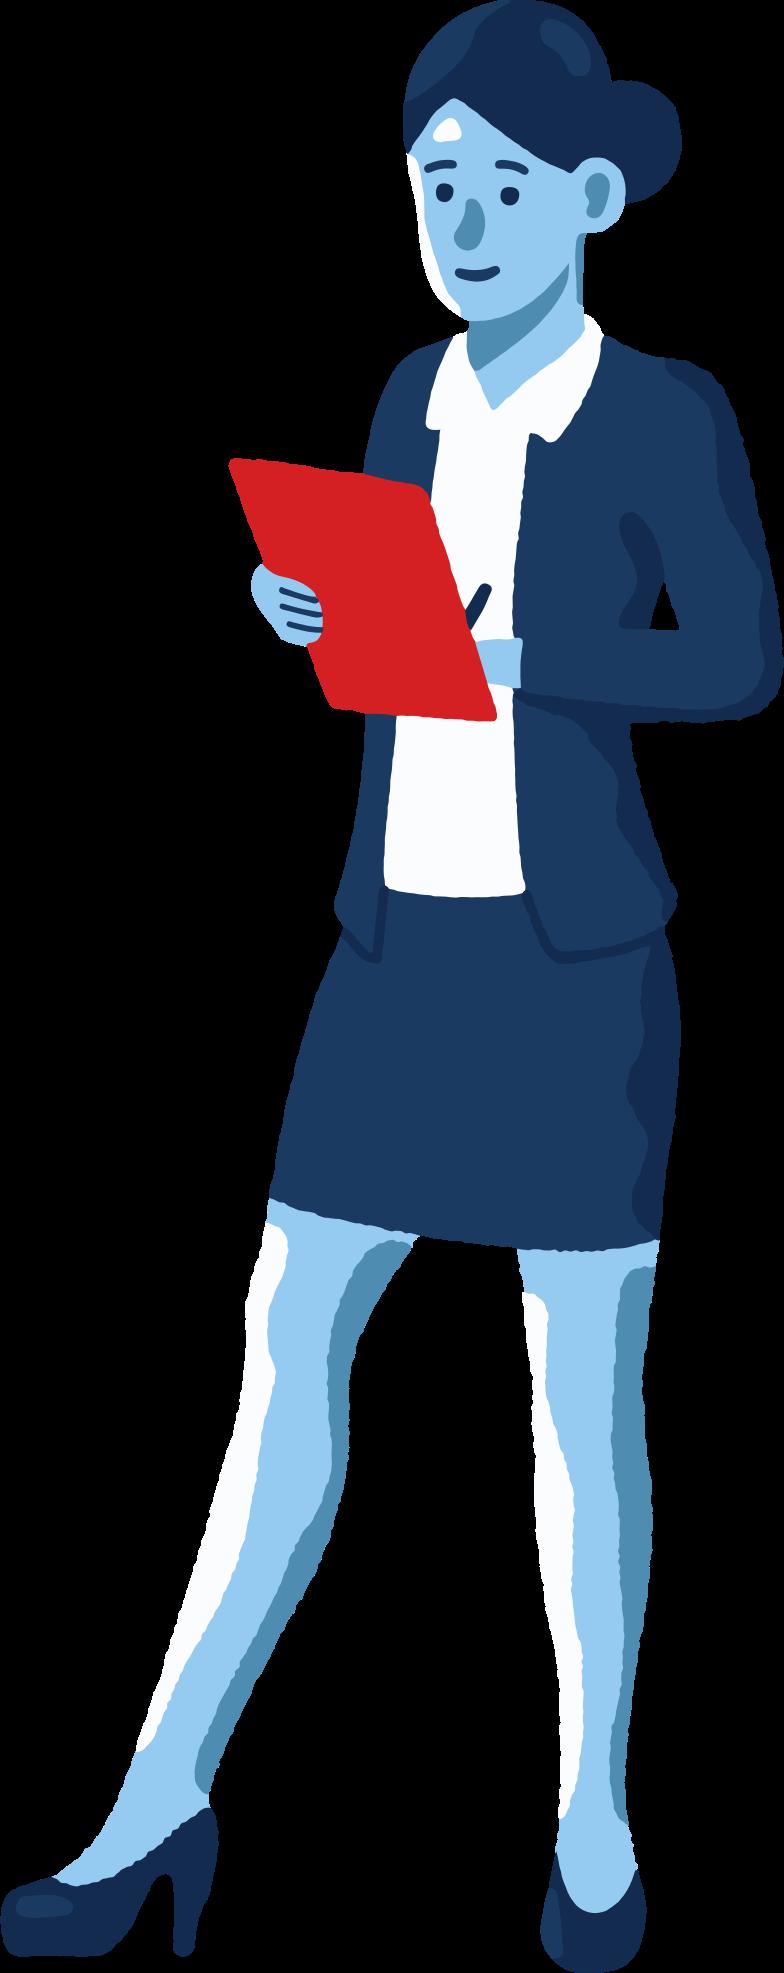 manager Clipart illustration in PNG, SVG